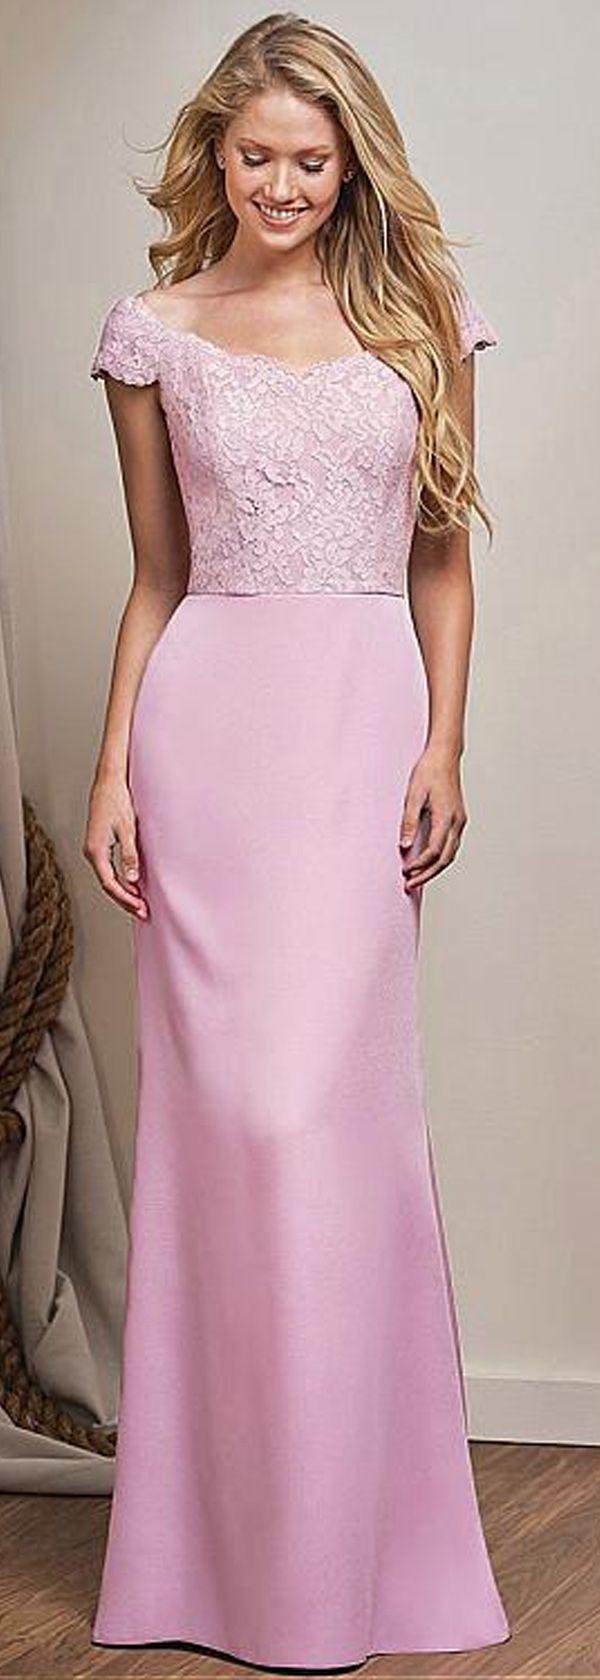 Romantic Lace & Stretch Satin Off-the-shoulder Neckline Sheath/Column Bridesmaid Dresses